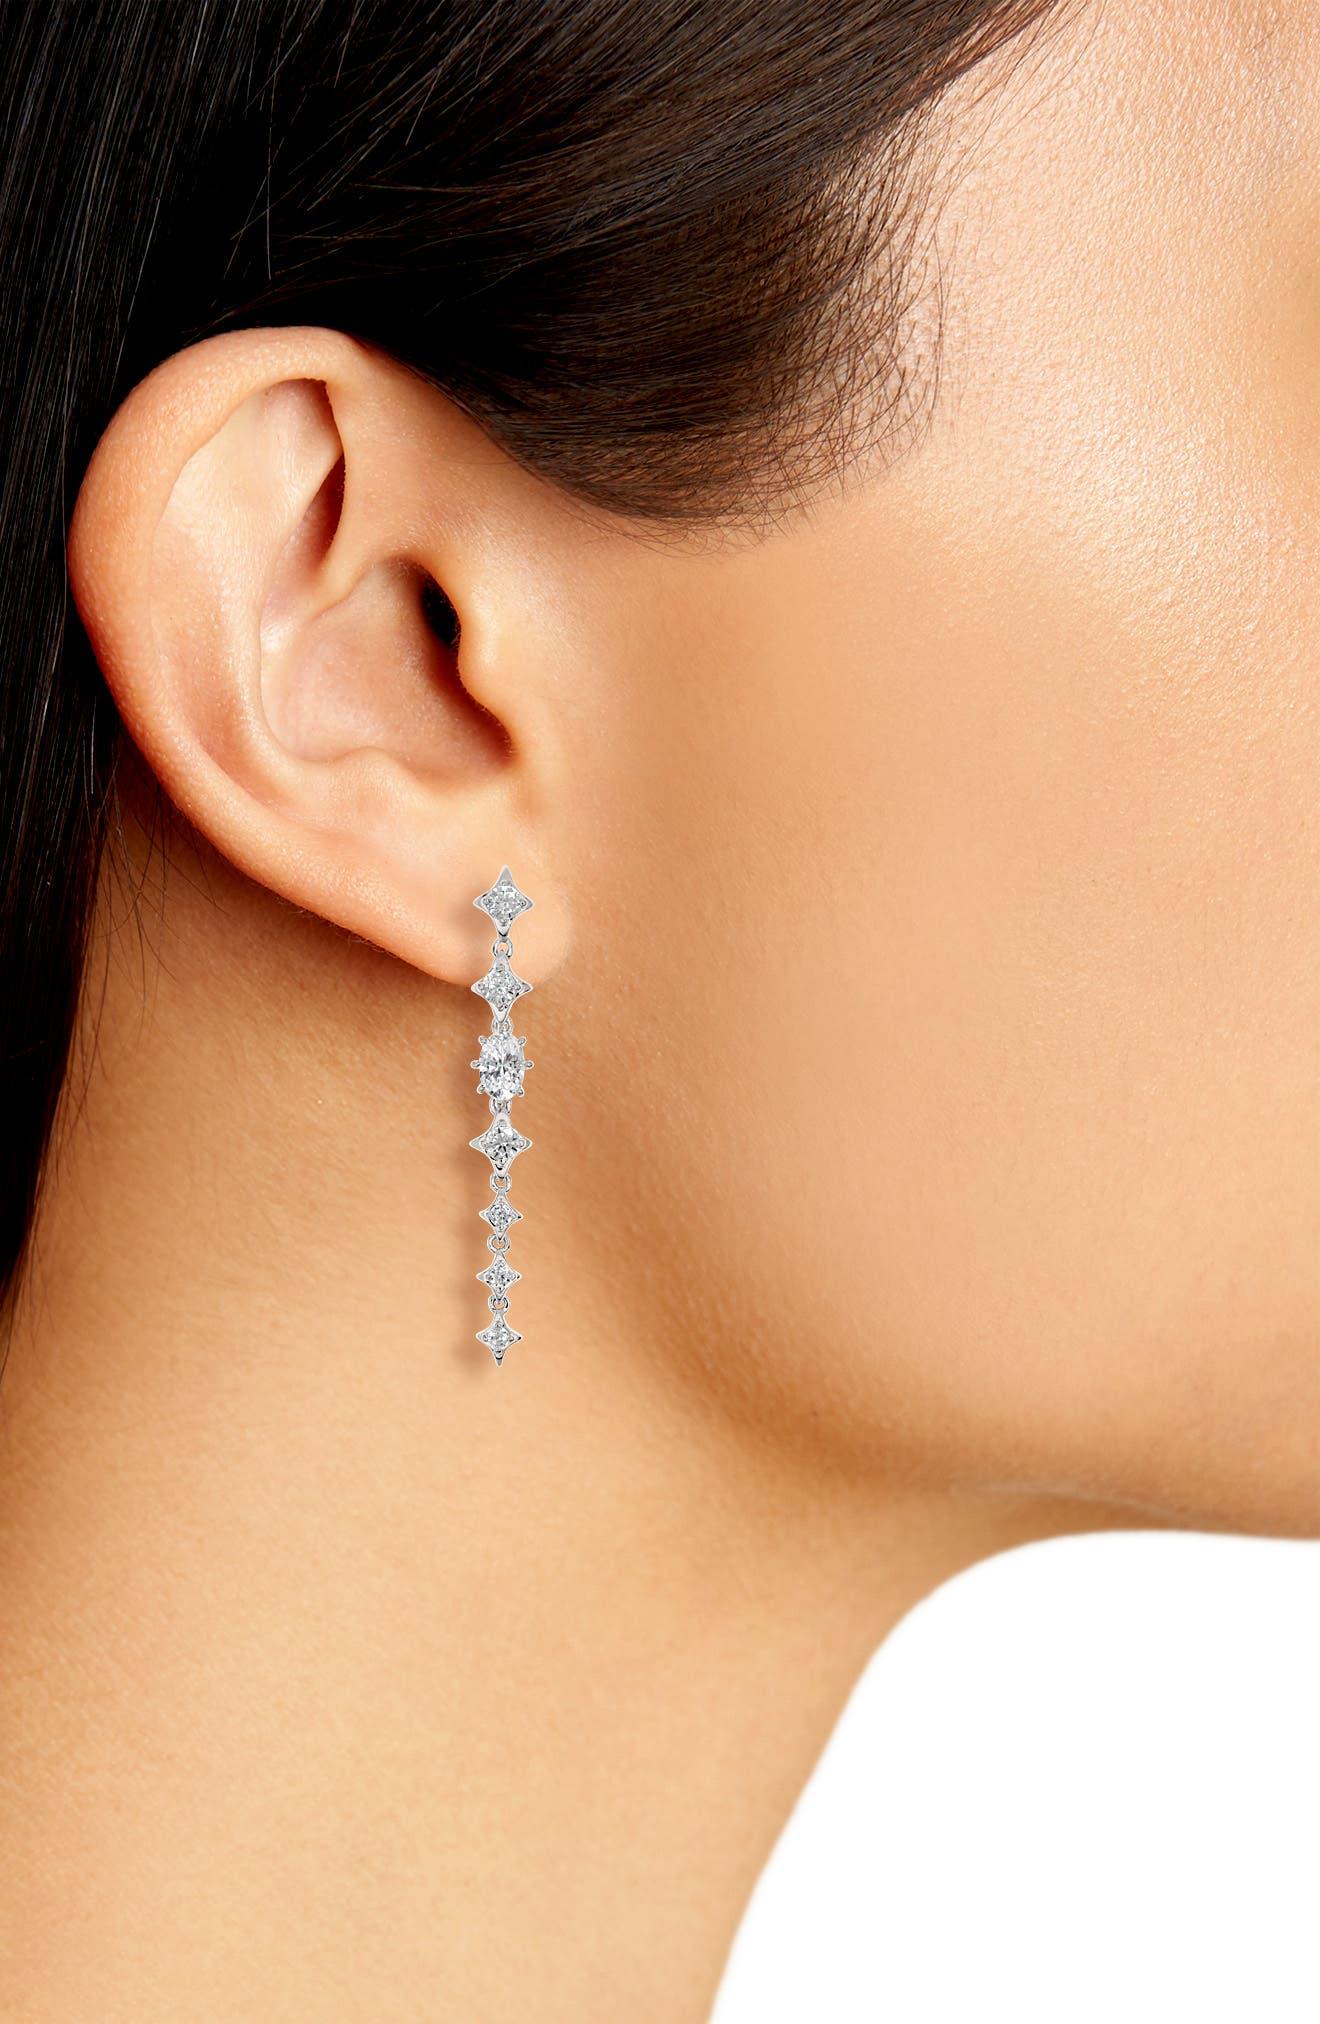 Boho Linear Drop Earrings,                             Alternate thumbnail 2, color,                             Silver/ Clear